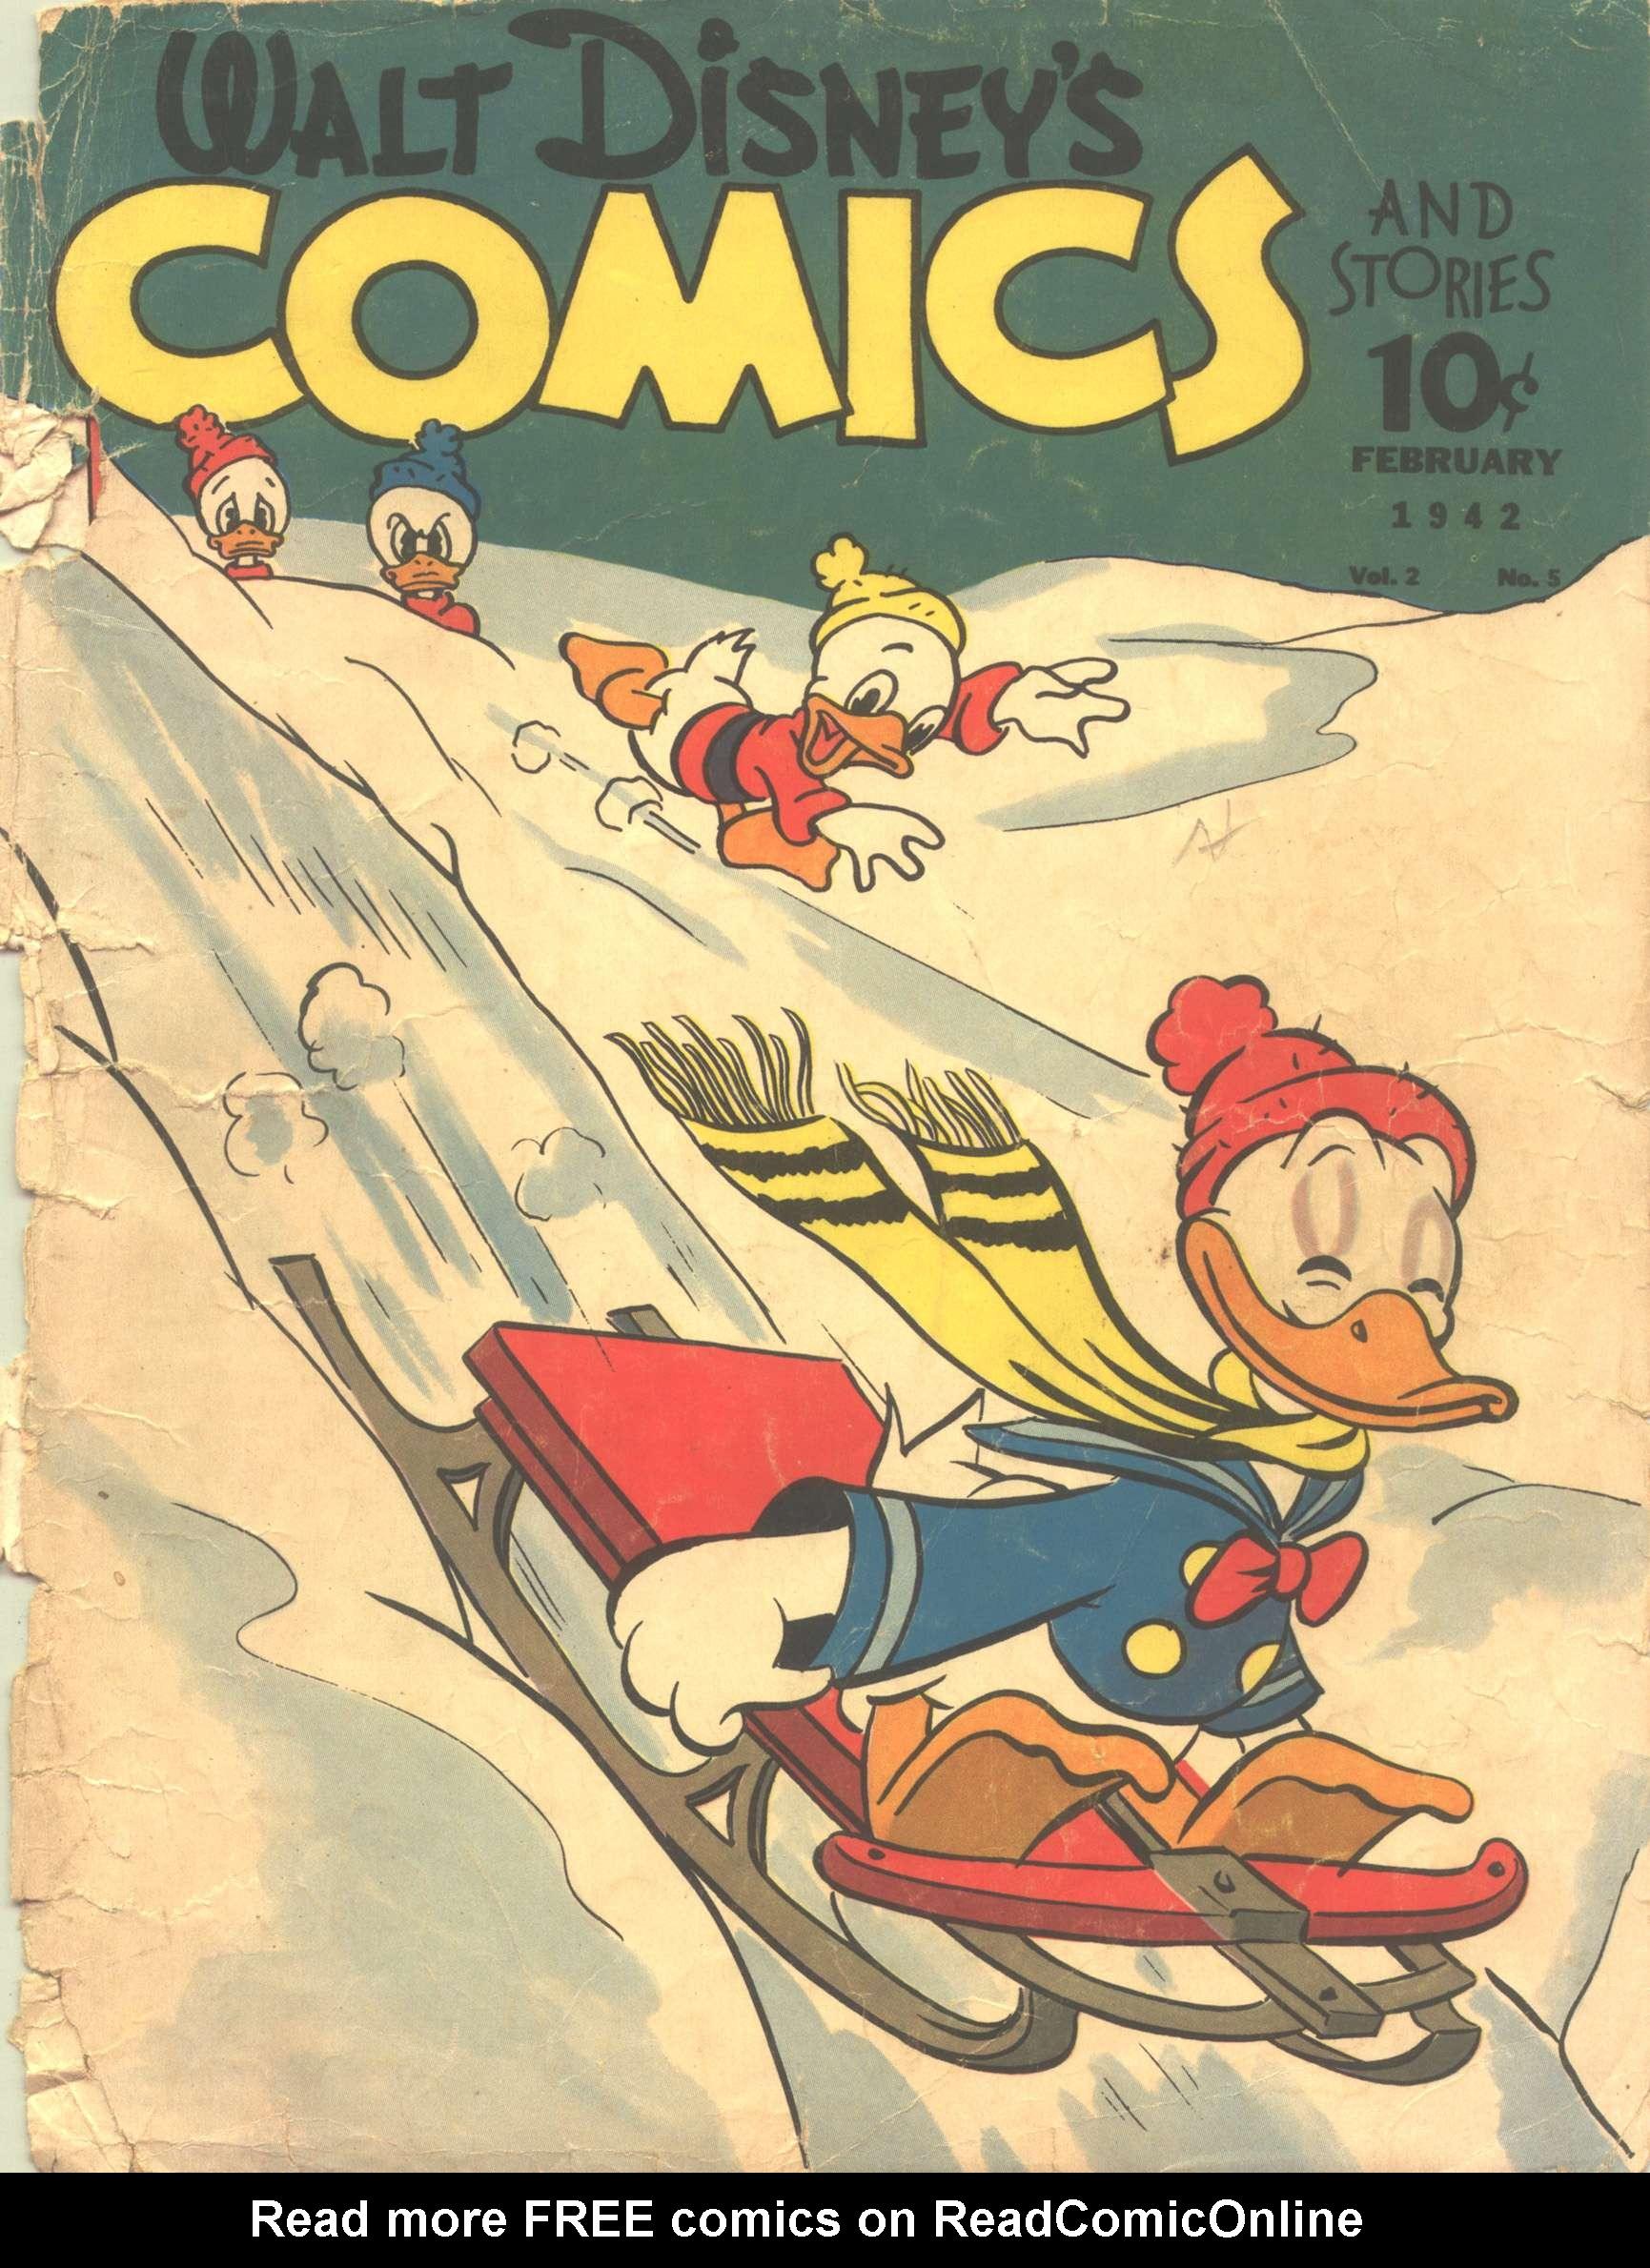 Walt Disneys Comics and Stories 17 Page 1